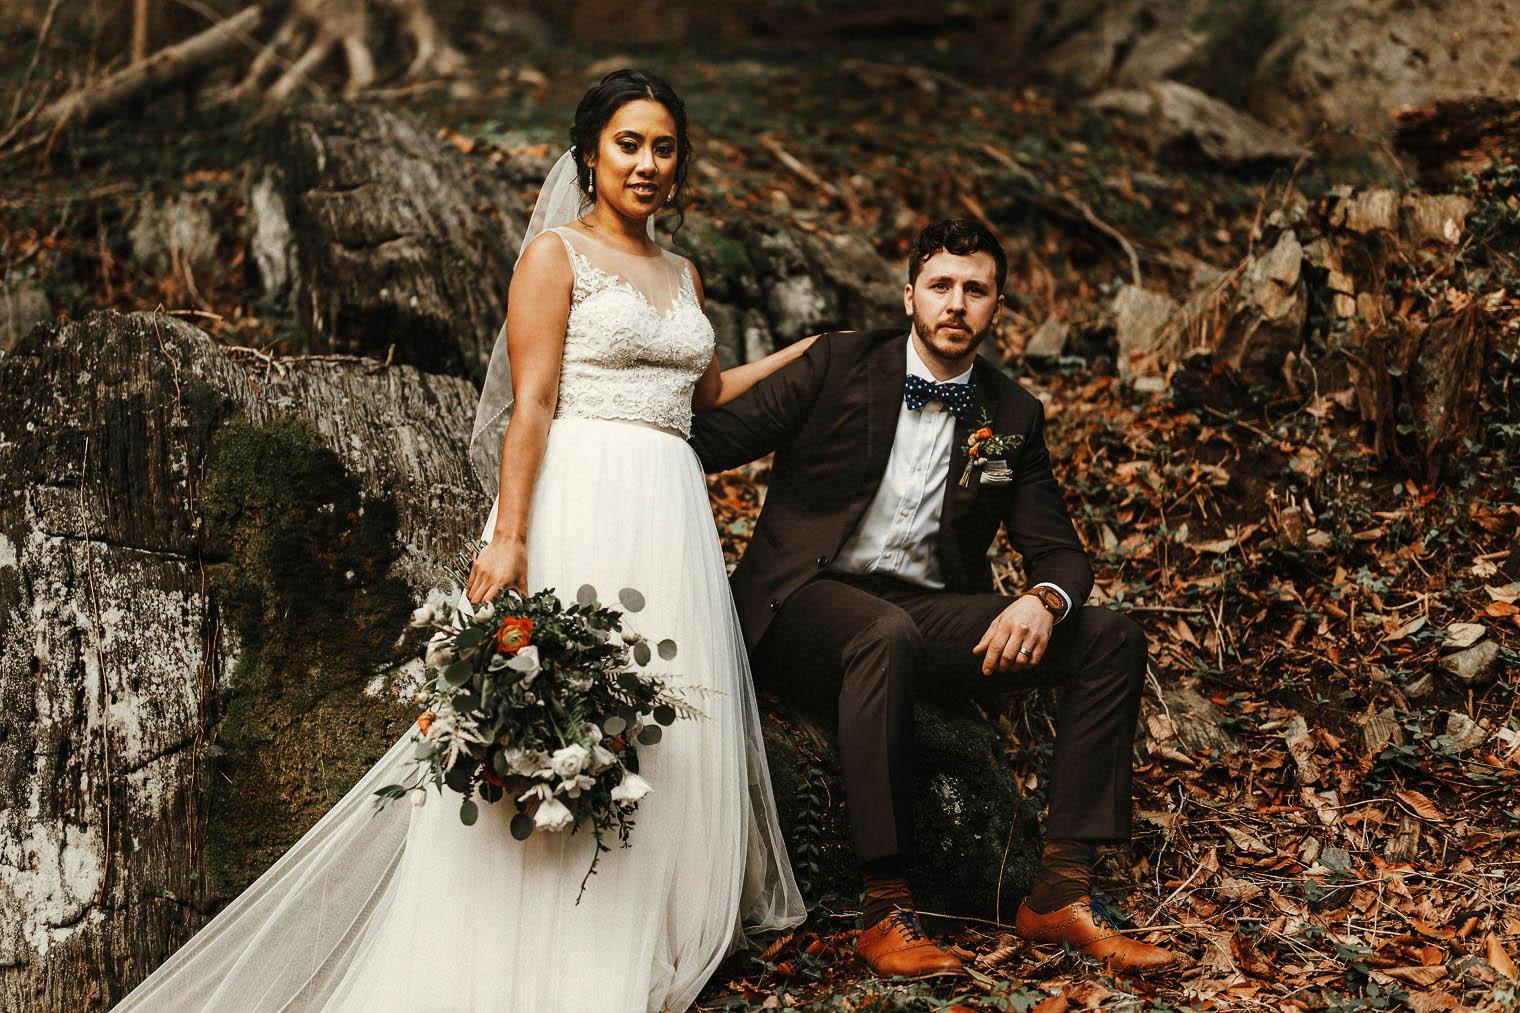 Amy-Mike-wedding-blog-67.jpg